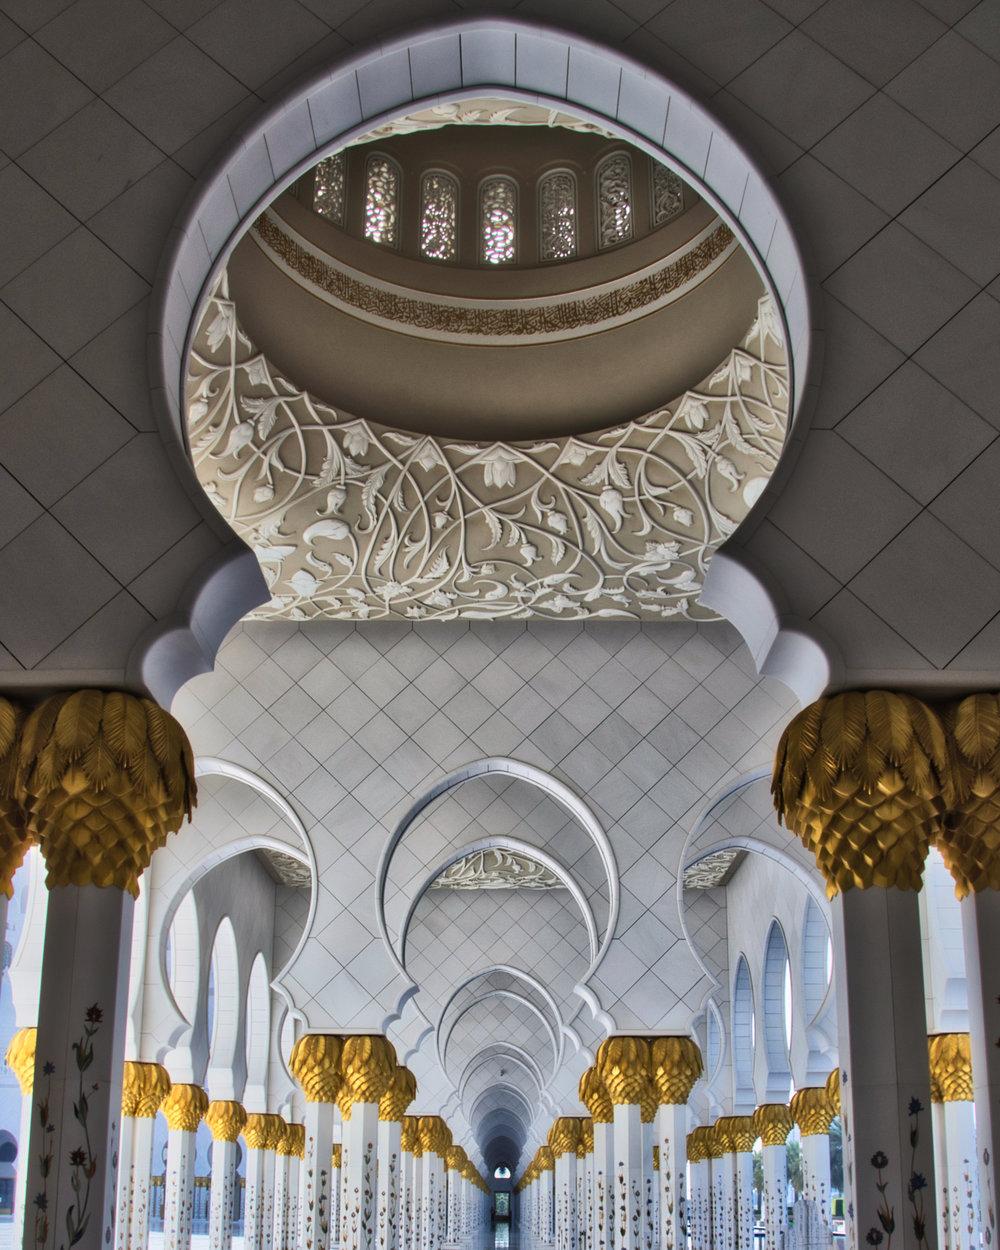 Moschea Abu Dhabi - colonnato -1255.jpeg